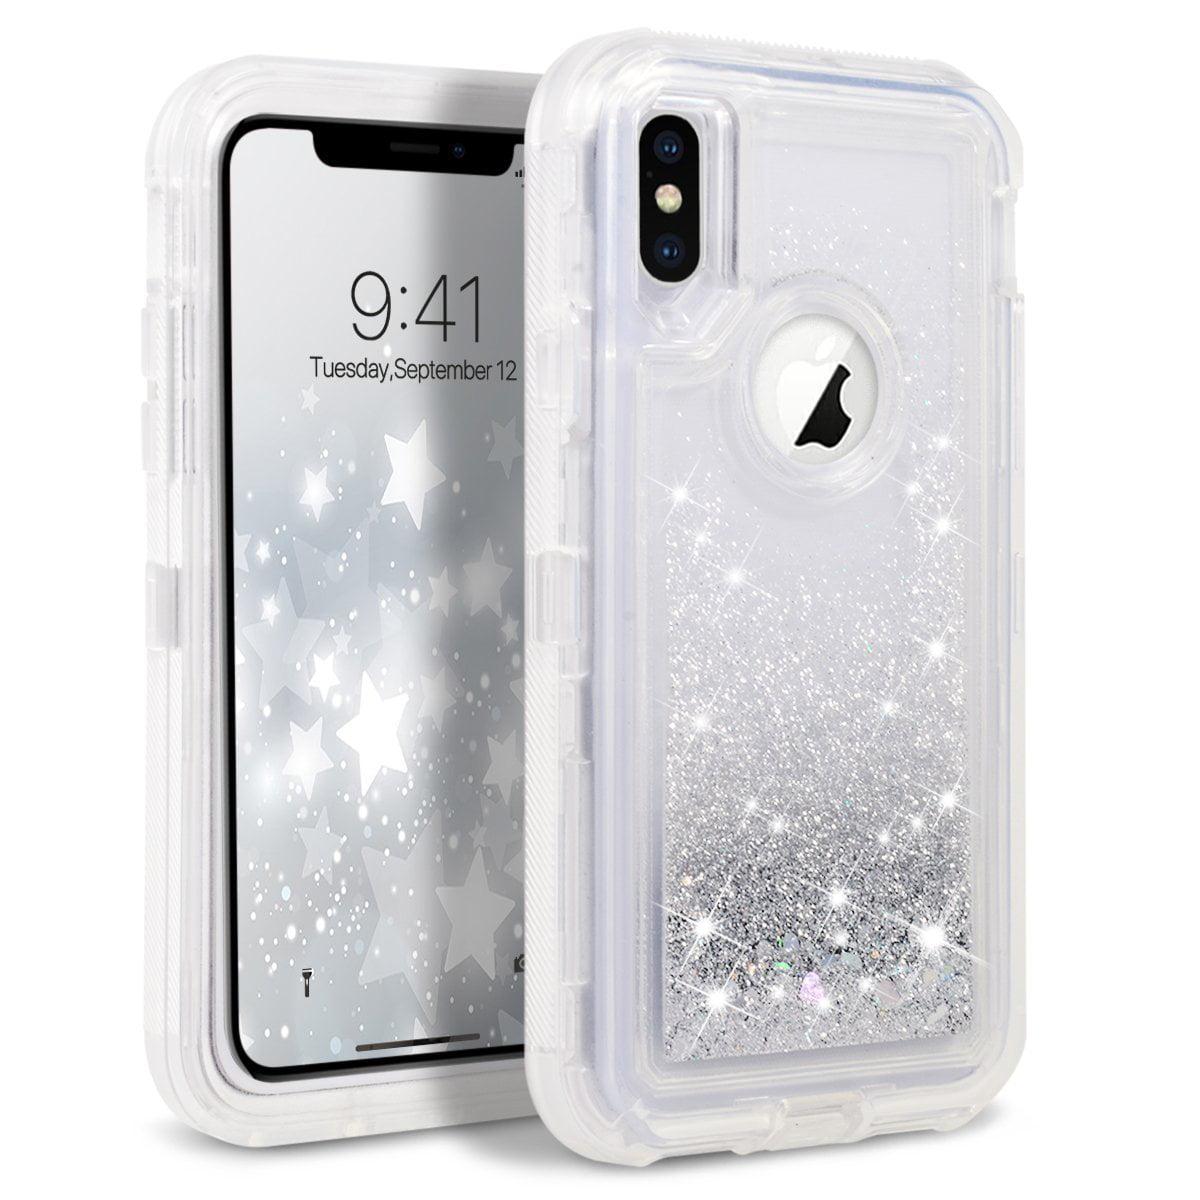 "Apple IPhone XS MAX (6.5"") Tough Defender Sparkling Liquid Glitter Heart Case Cover"